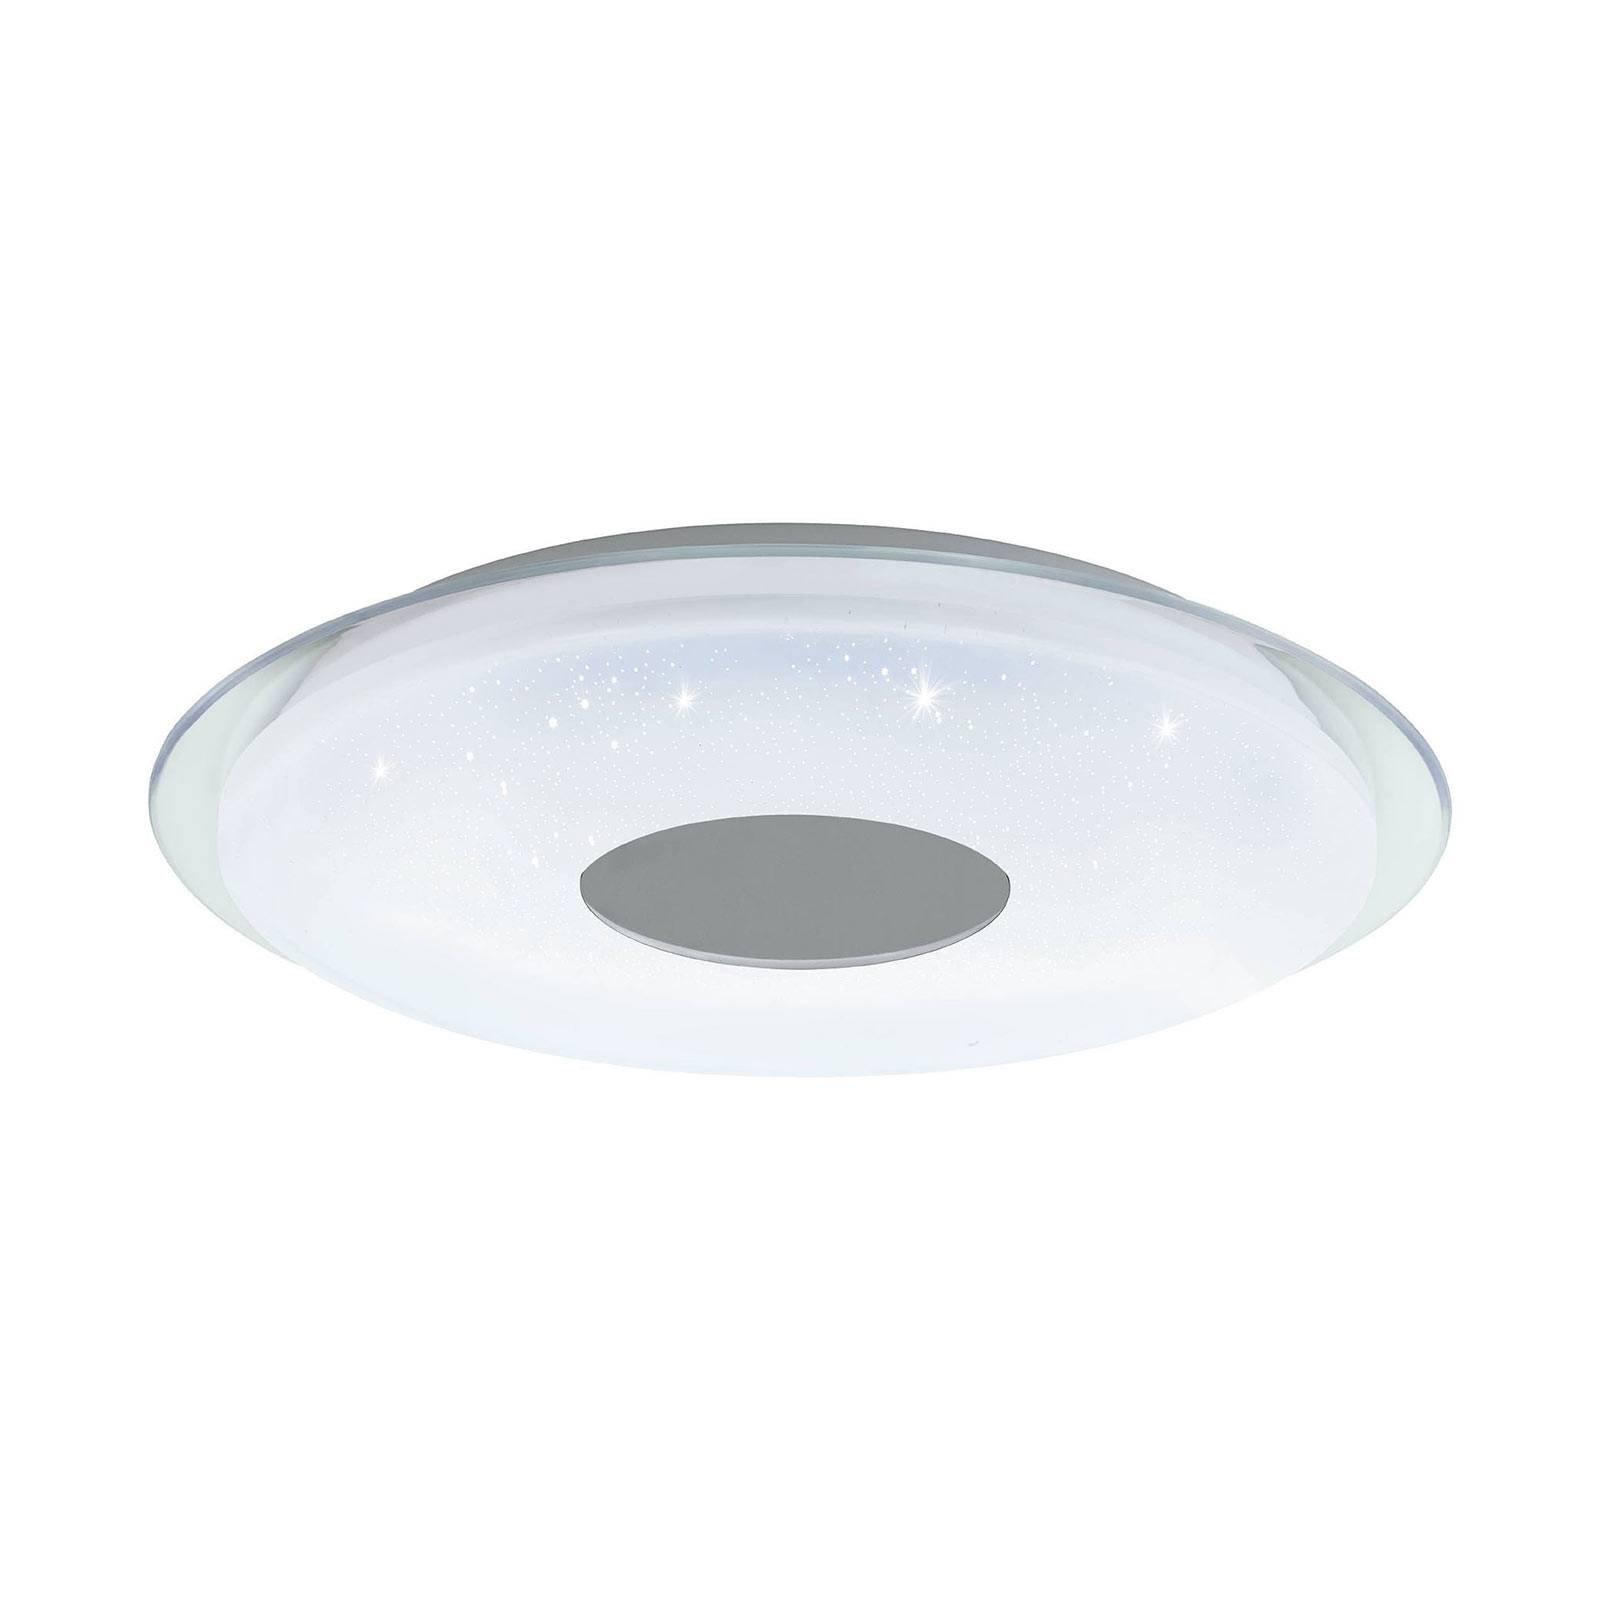 EGLO connect Lanciano-C LED-taklampe Ø 56cm